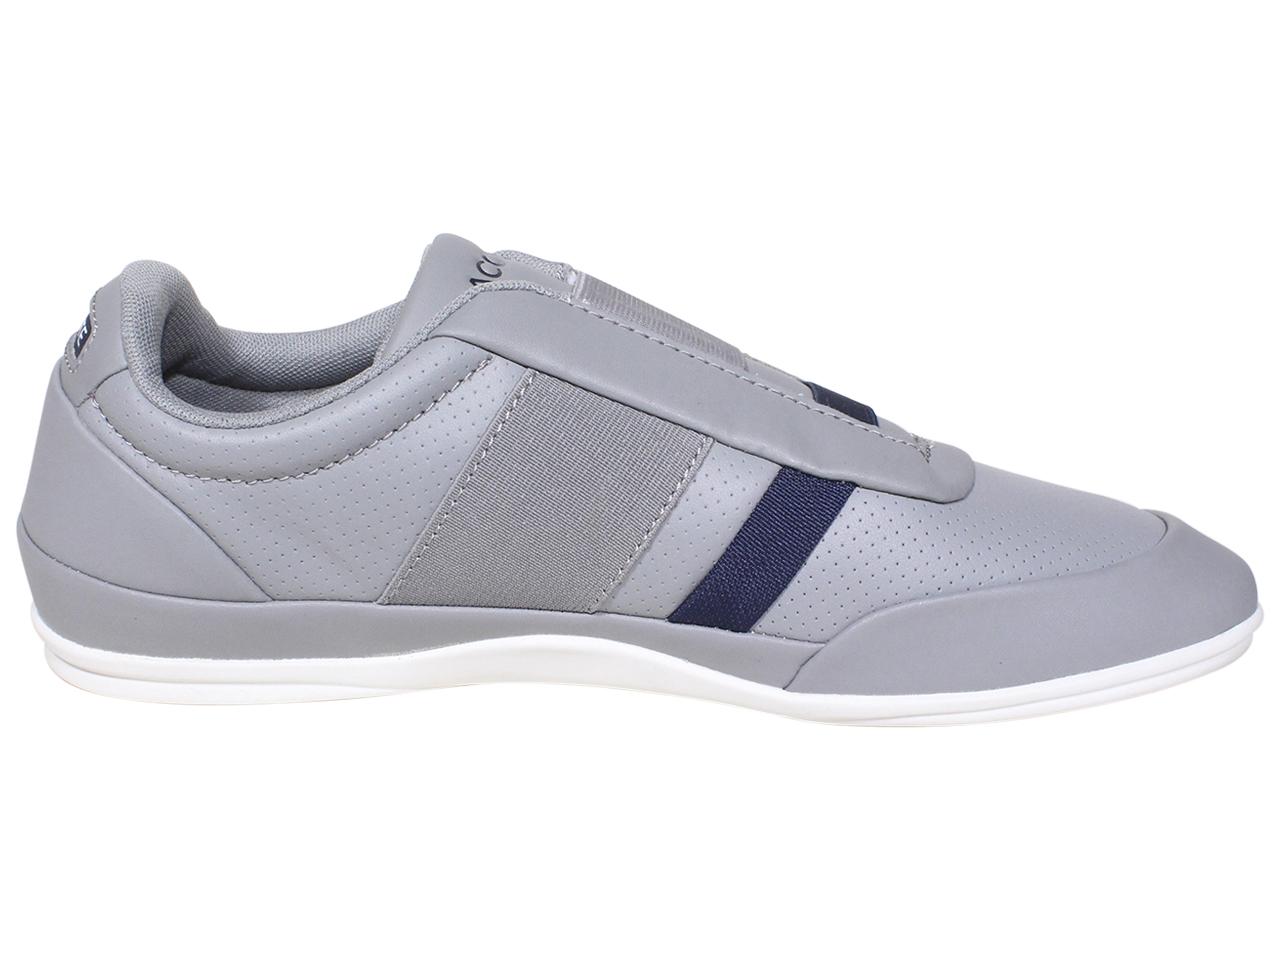 Lacoste-Misano-Elastic-318-Sneakers-Men-039-s-Low-Top-Shoes thumbnail 12